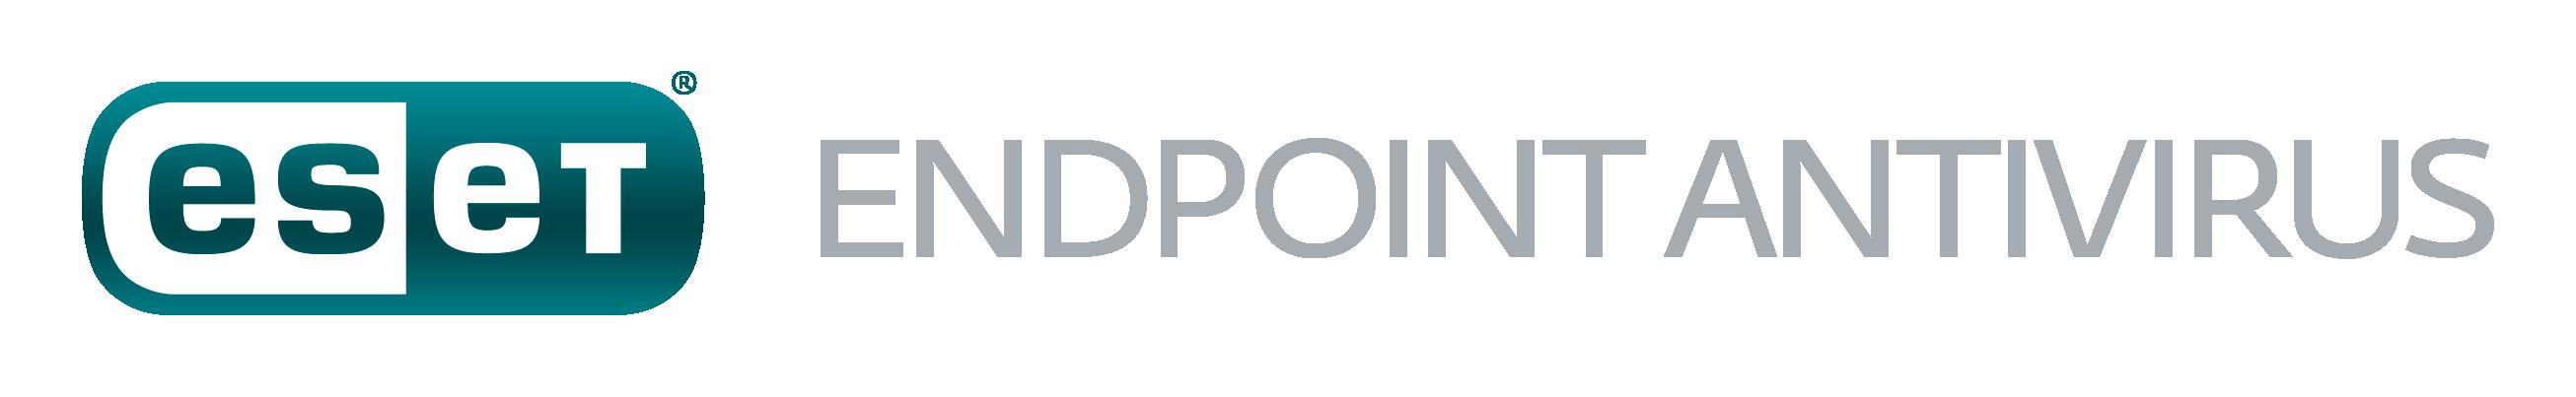 logotype - ESET Endpoint Antivirus-04